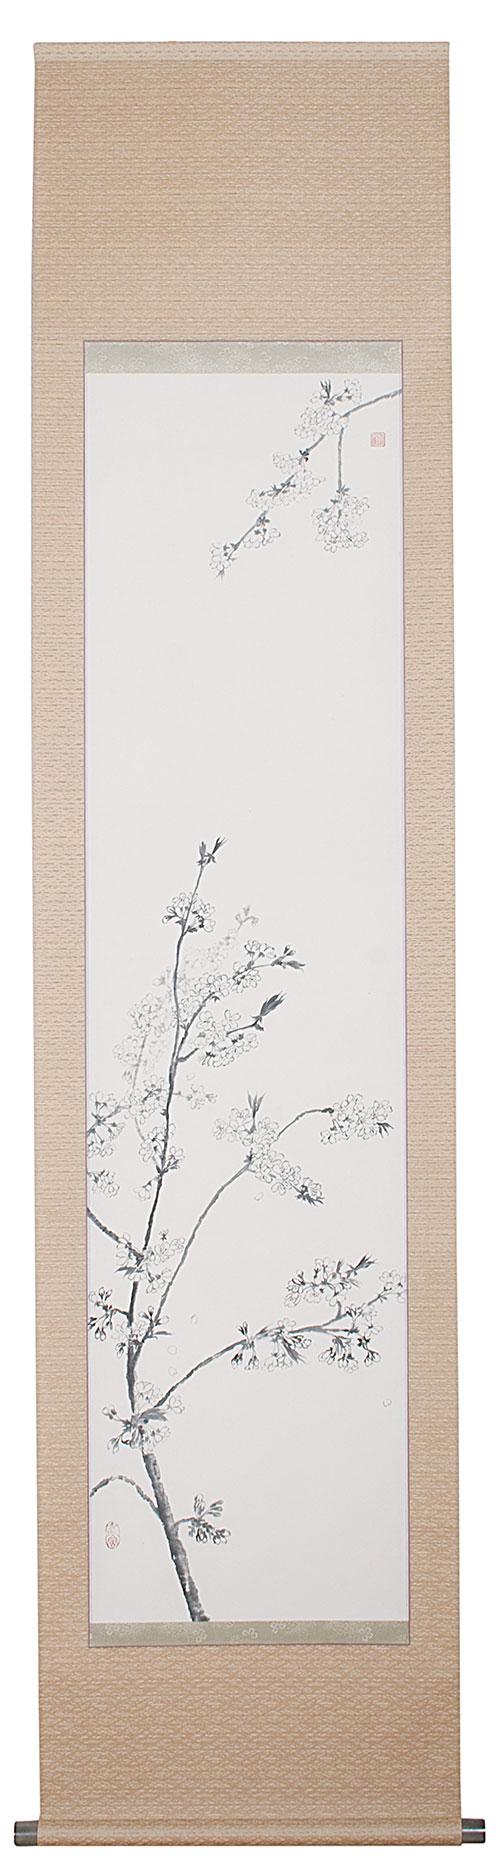 160-Kirschenblüten--braun-lila-grünIMG_4986-Kopie.jpg